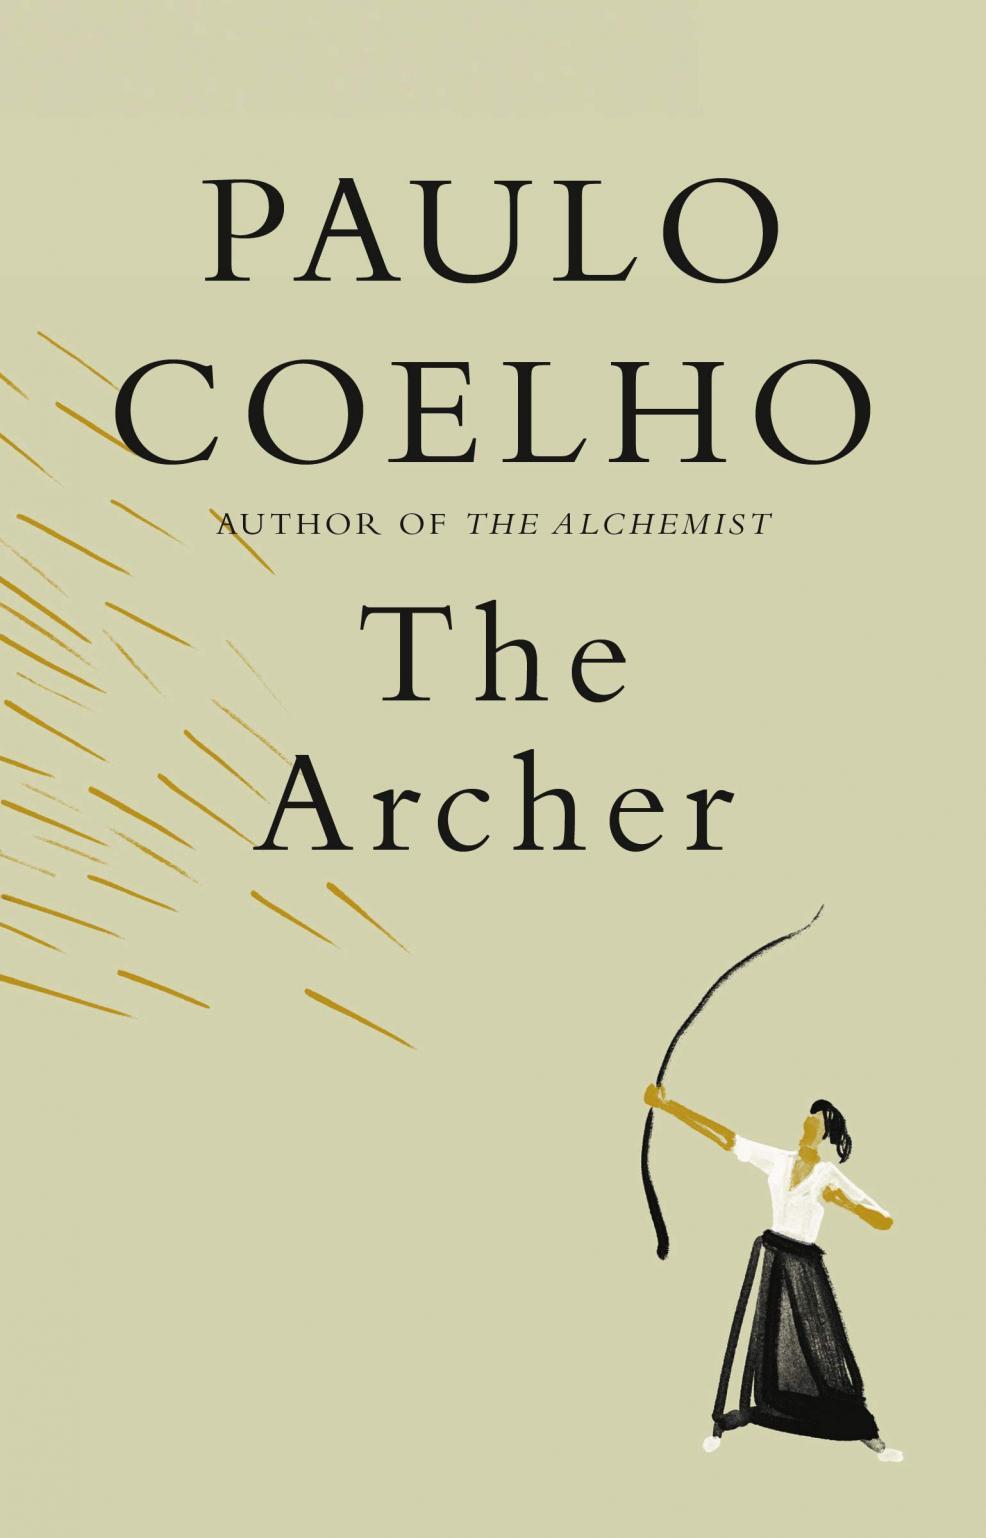 The archer : a novel